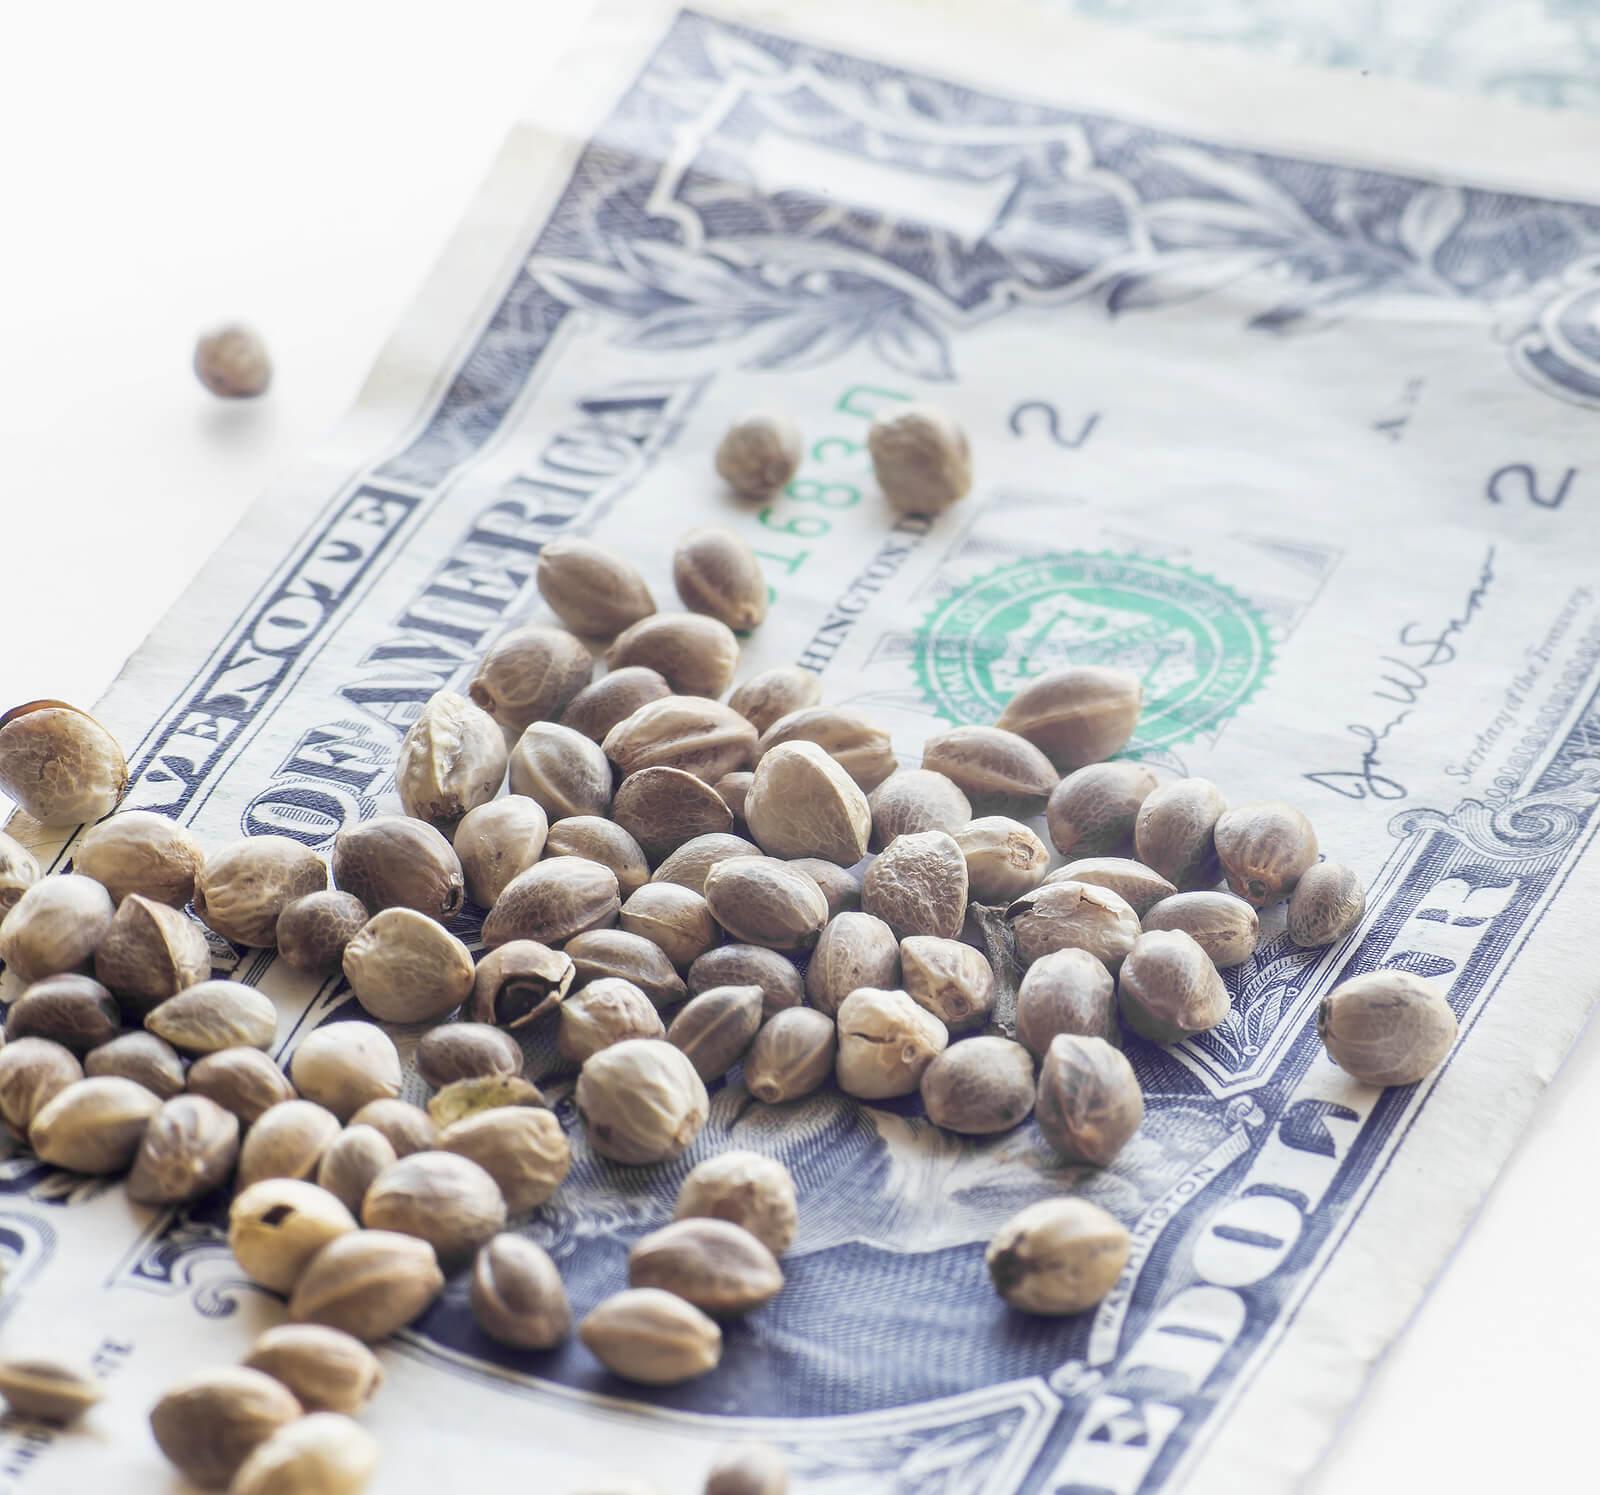 Buy Marijuana Seeds In Texas